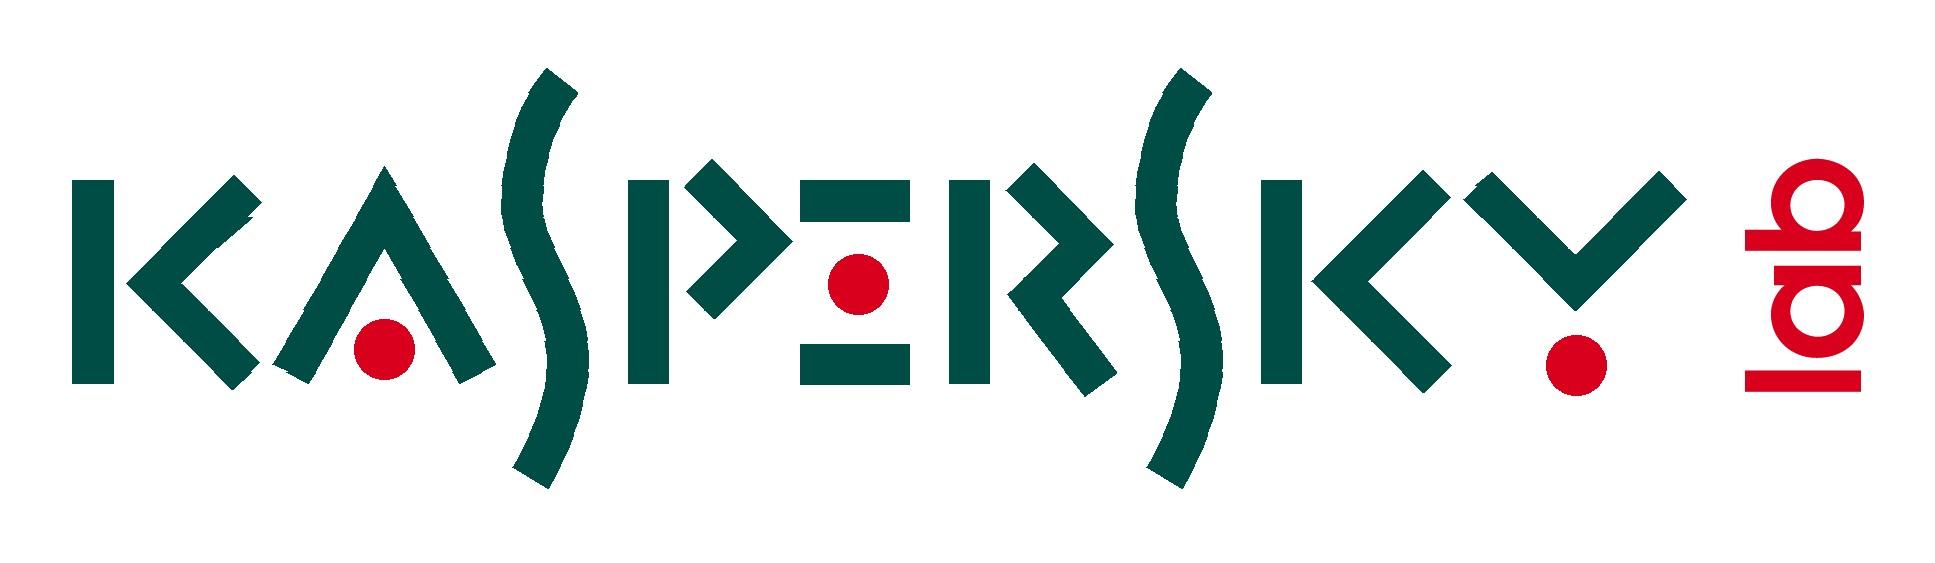 kaspersky_logo.jpg